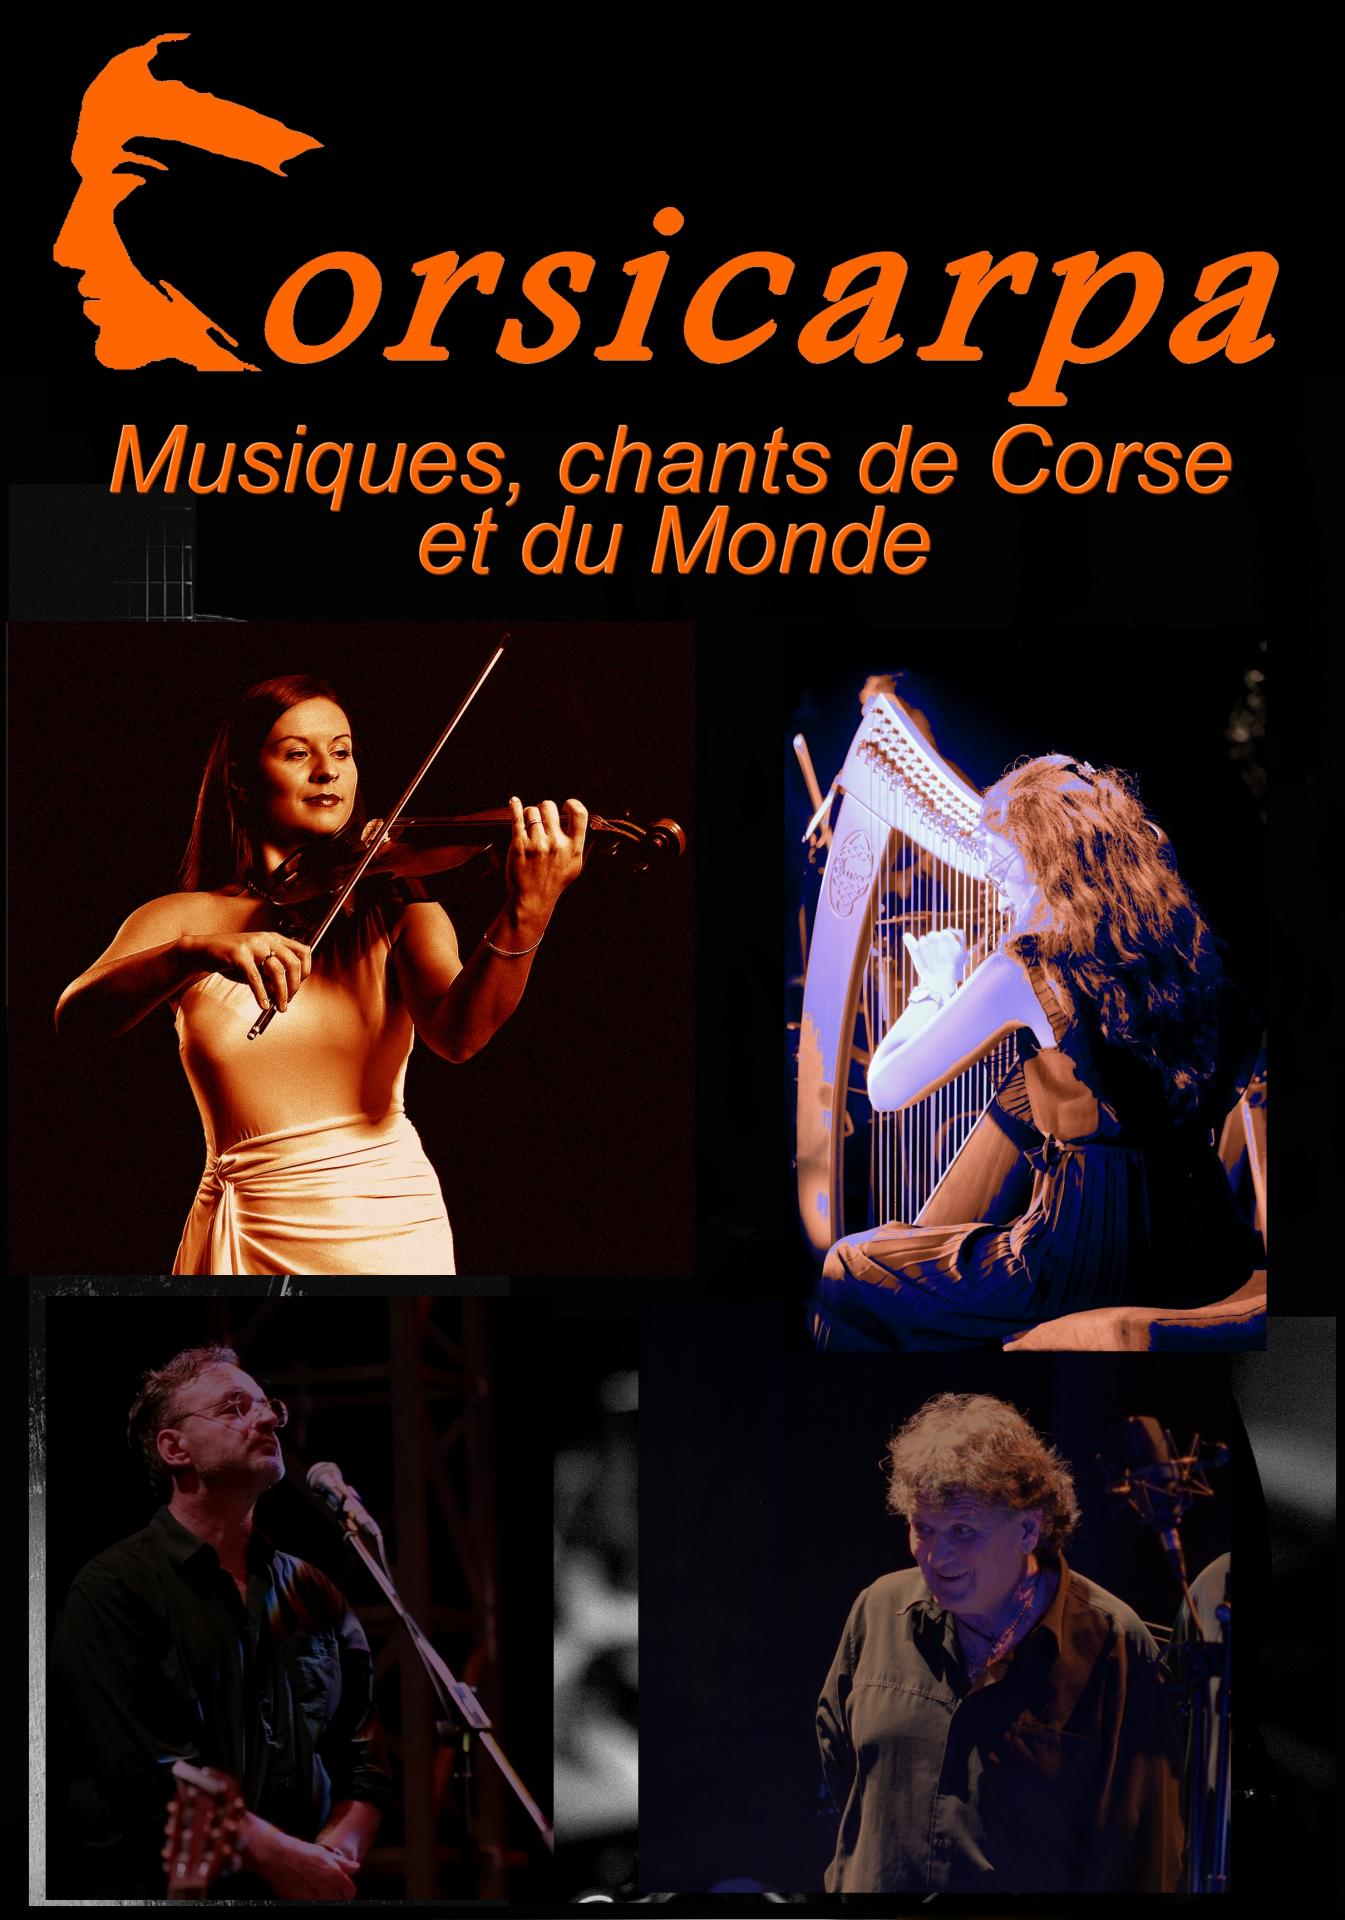 Corsicarpa affiche 2021